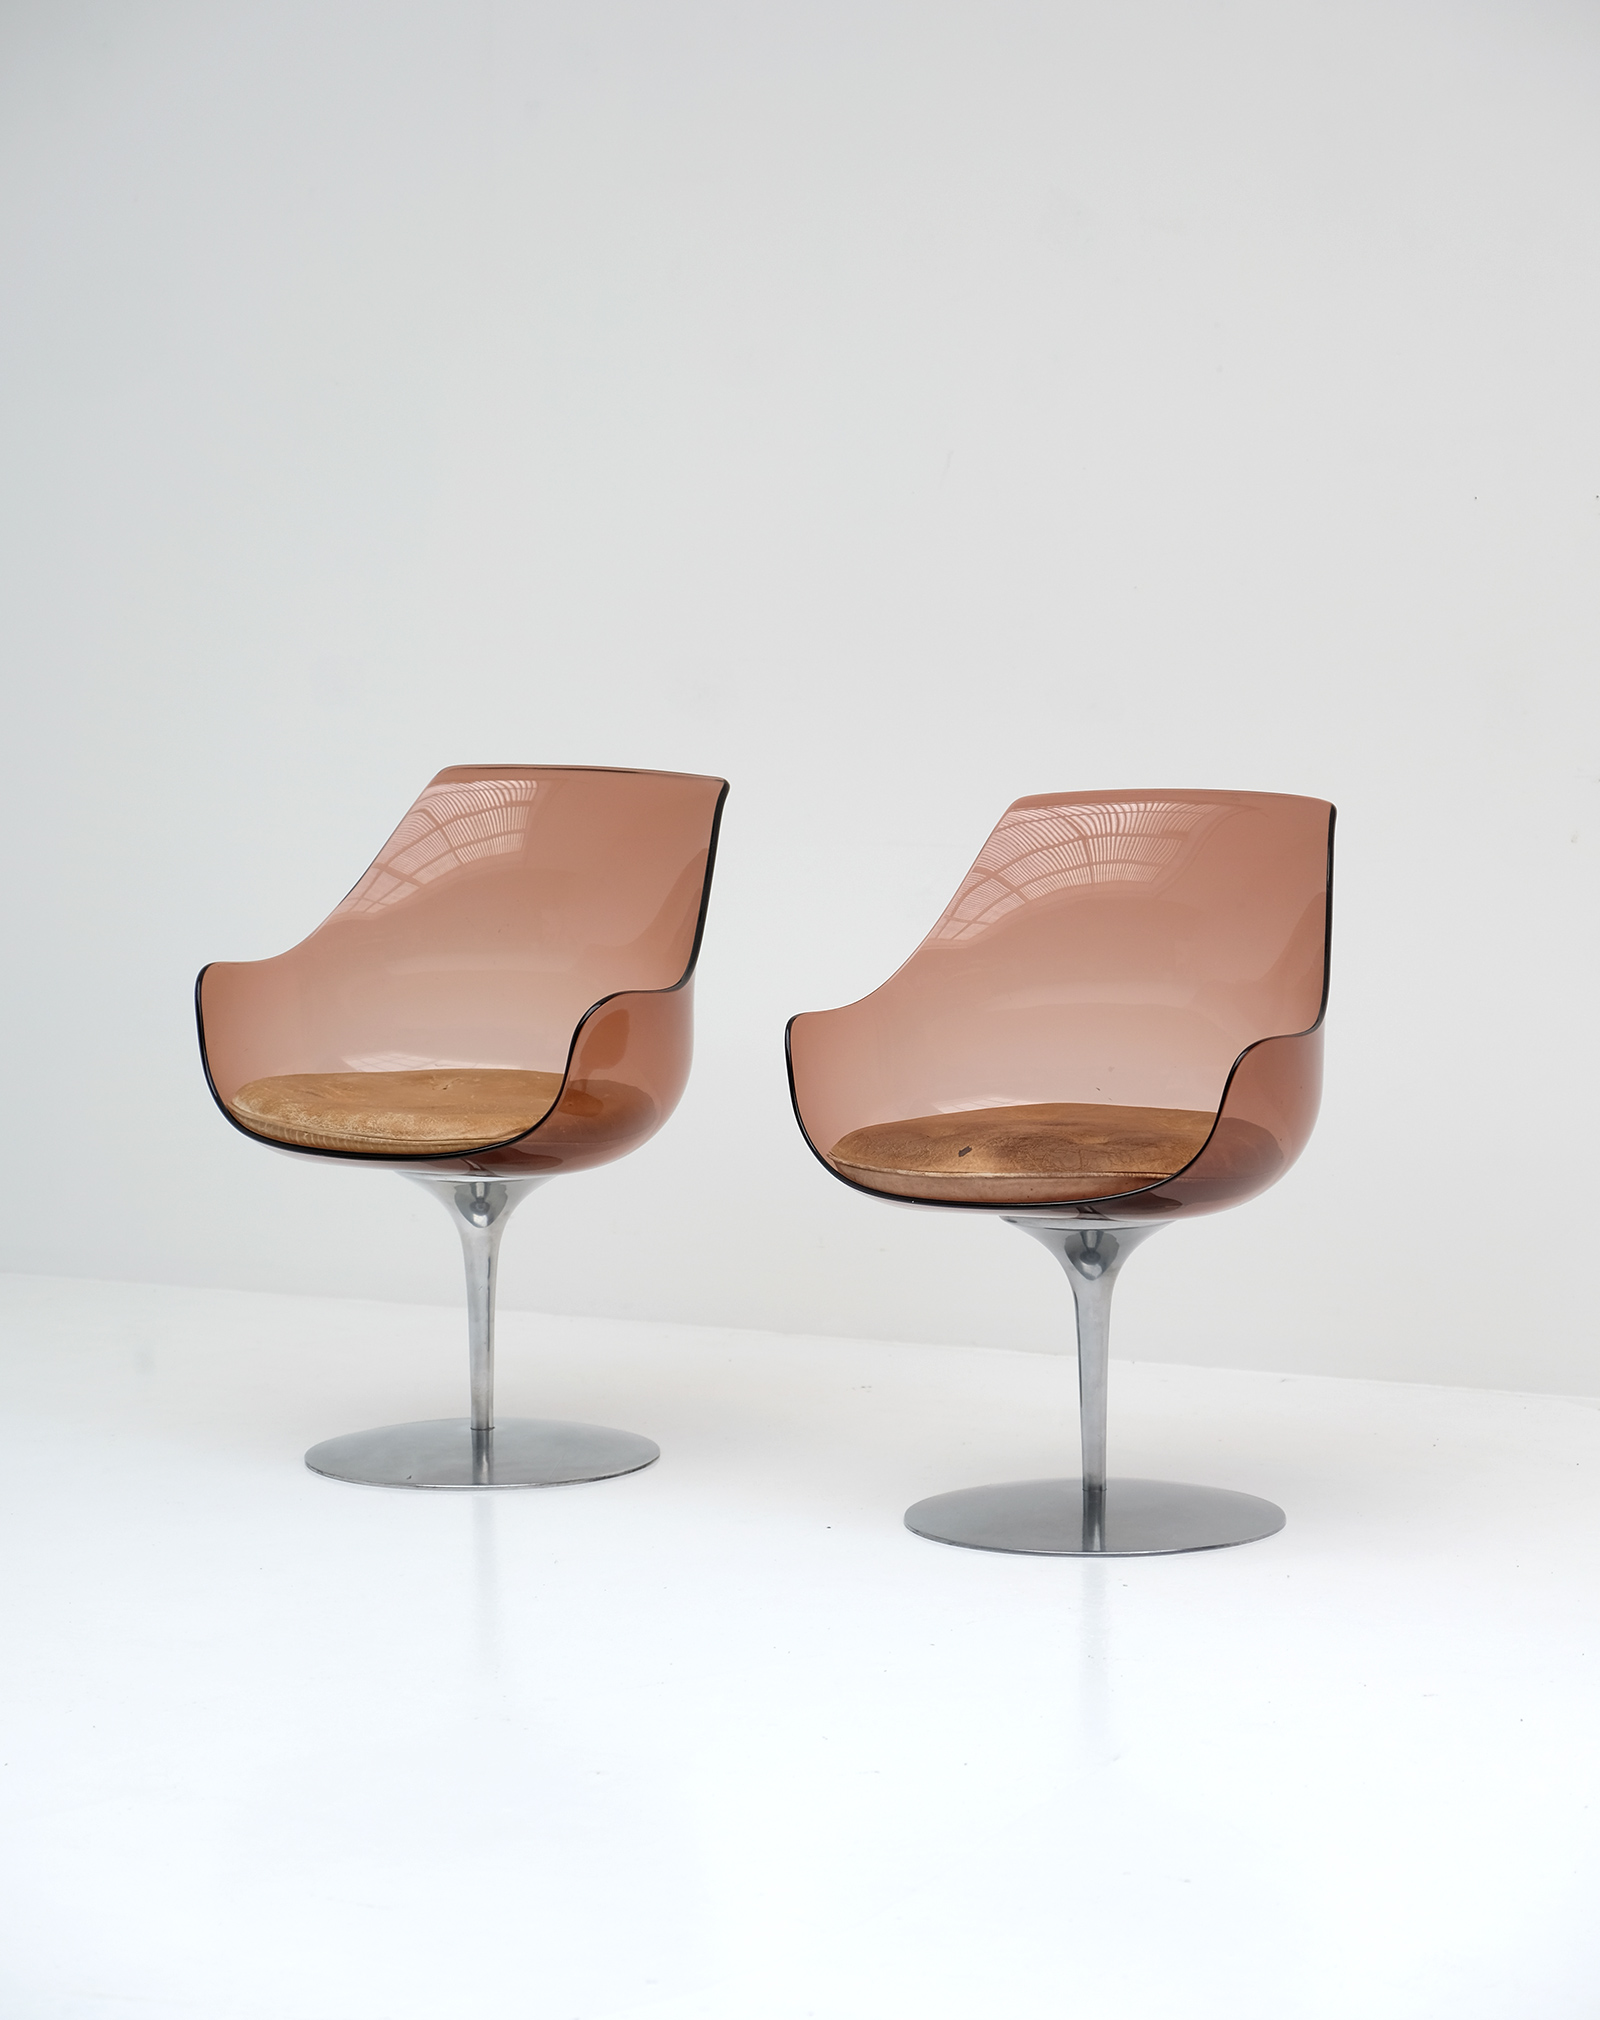 Laverne Champagne Chairs Formes Nouvelles